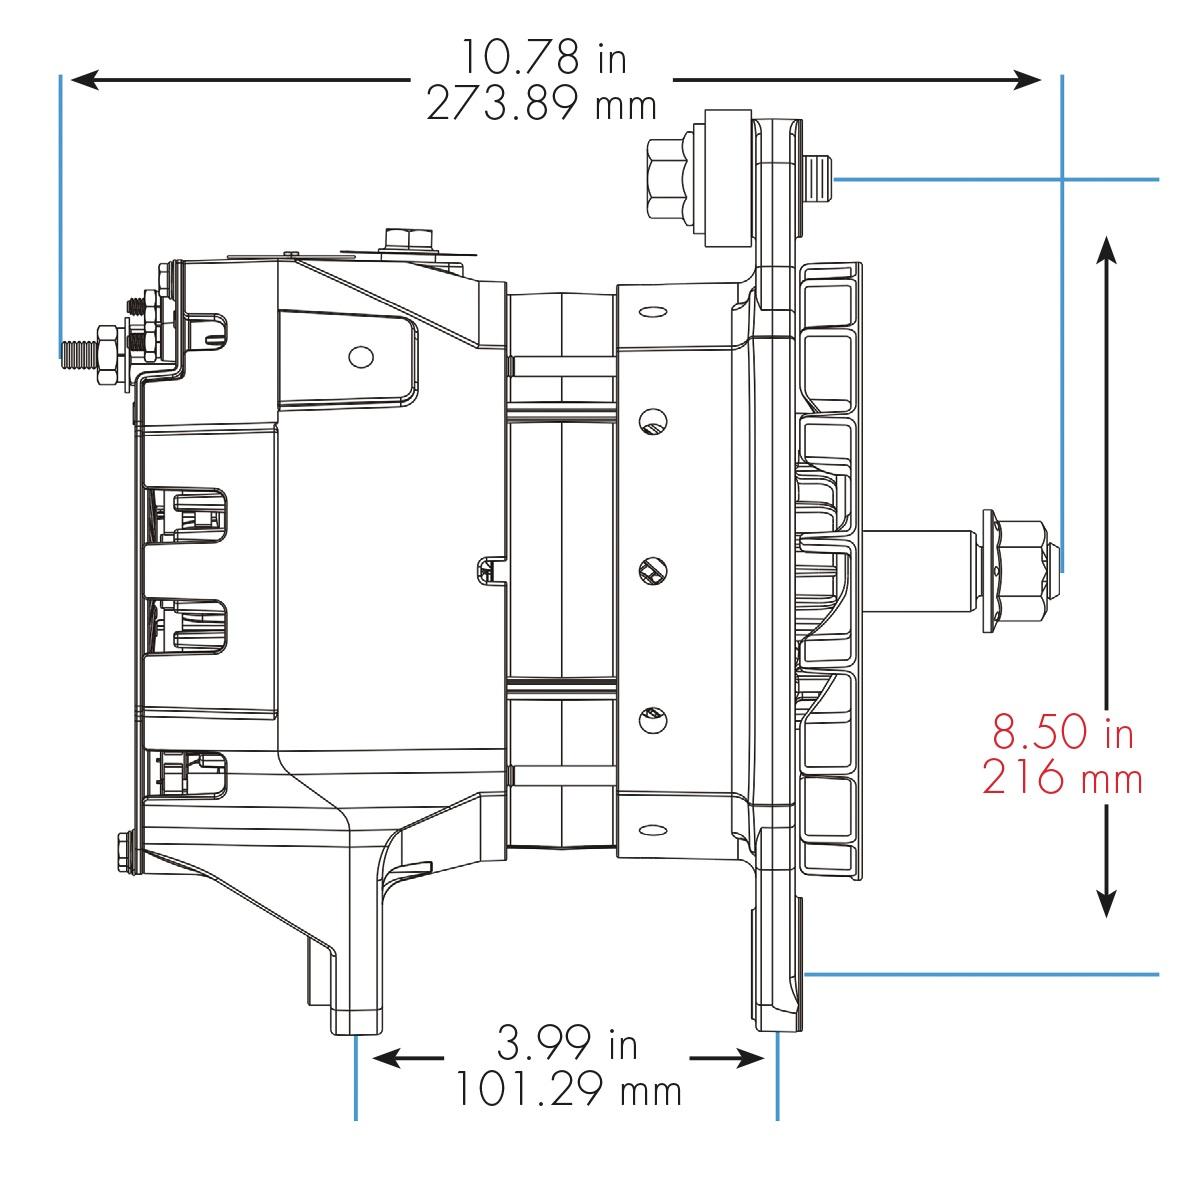 hight resolution of two wire acdelco alternator wiring schematic chevy 4 wire delco alternator farmall 706 wiring diagram